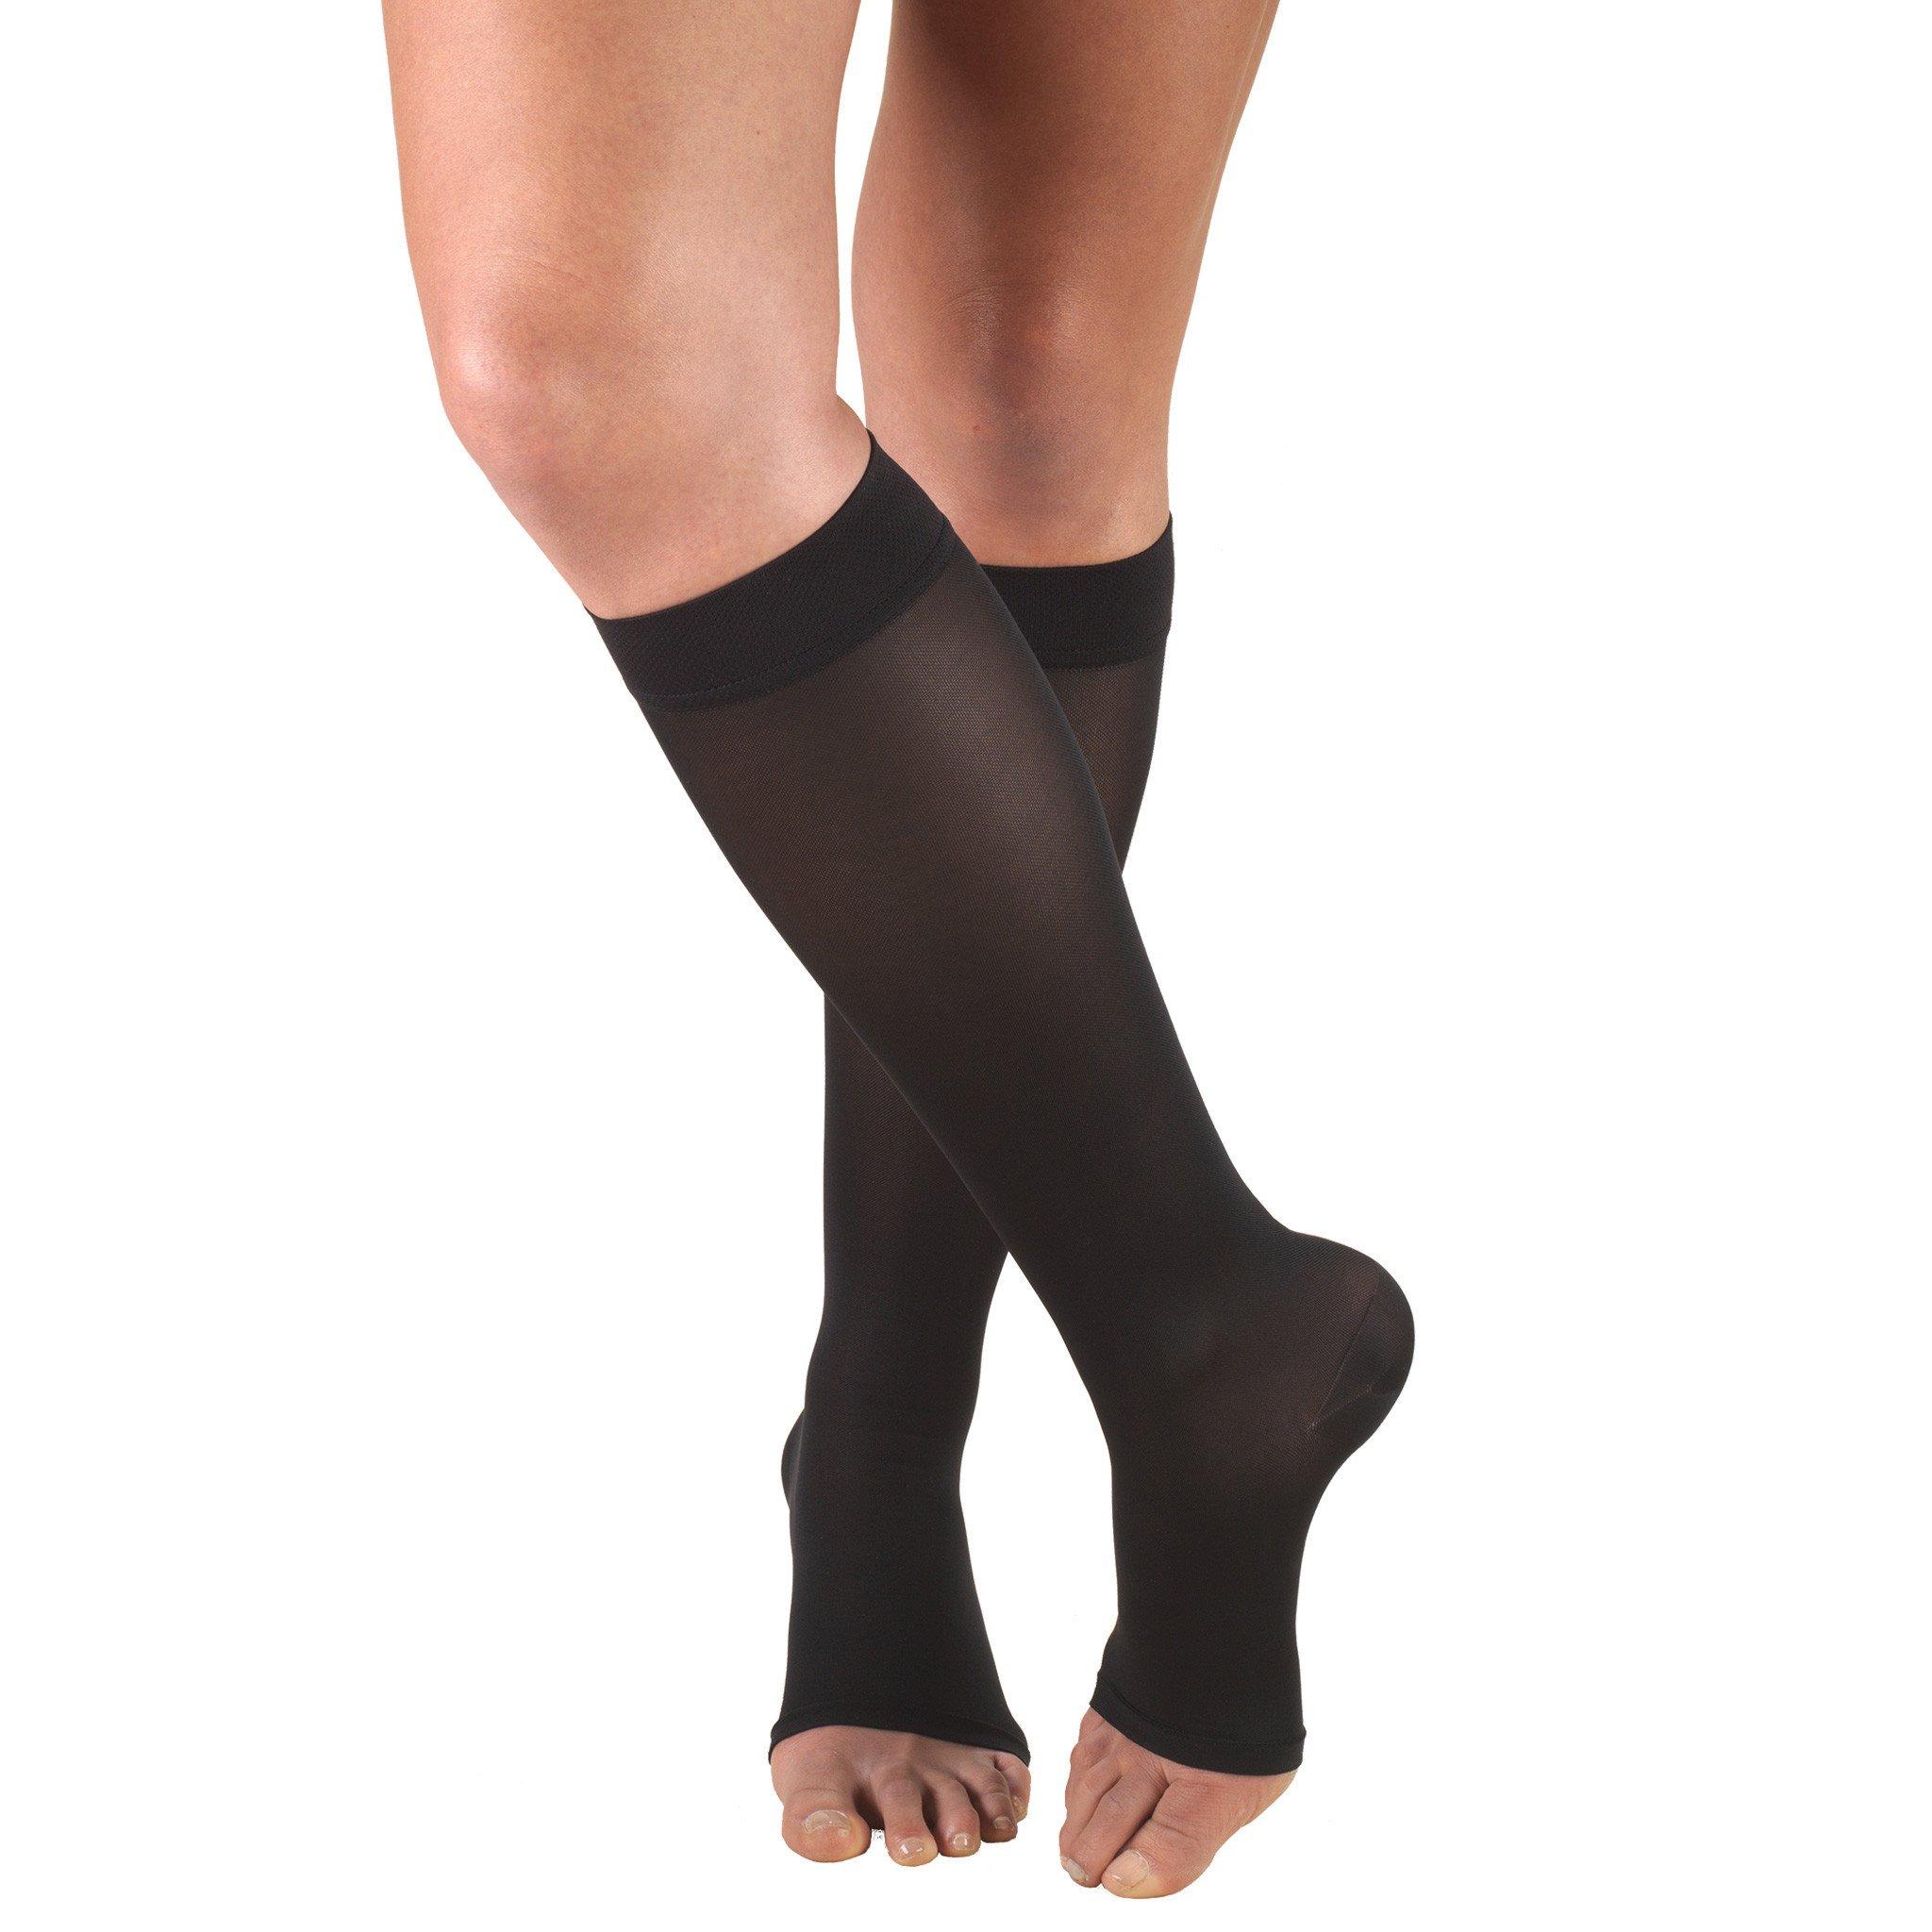 583cfe37c Amazon.com  Truform Sheer Compression Stockings